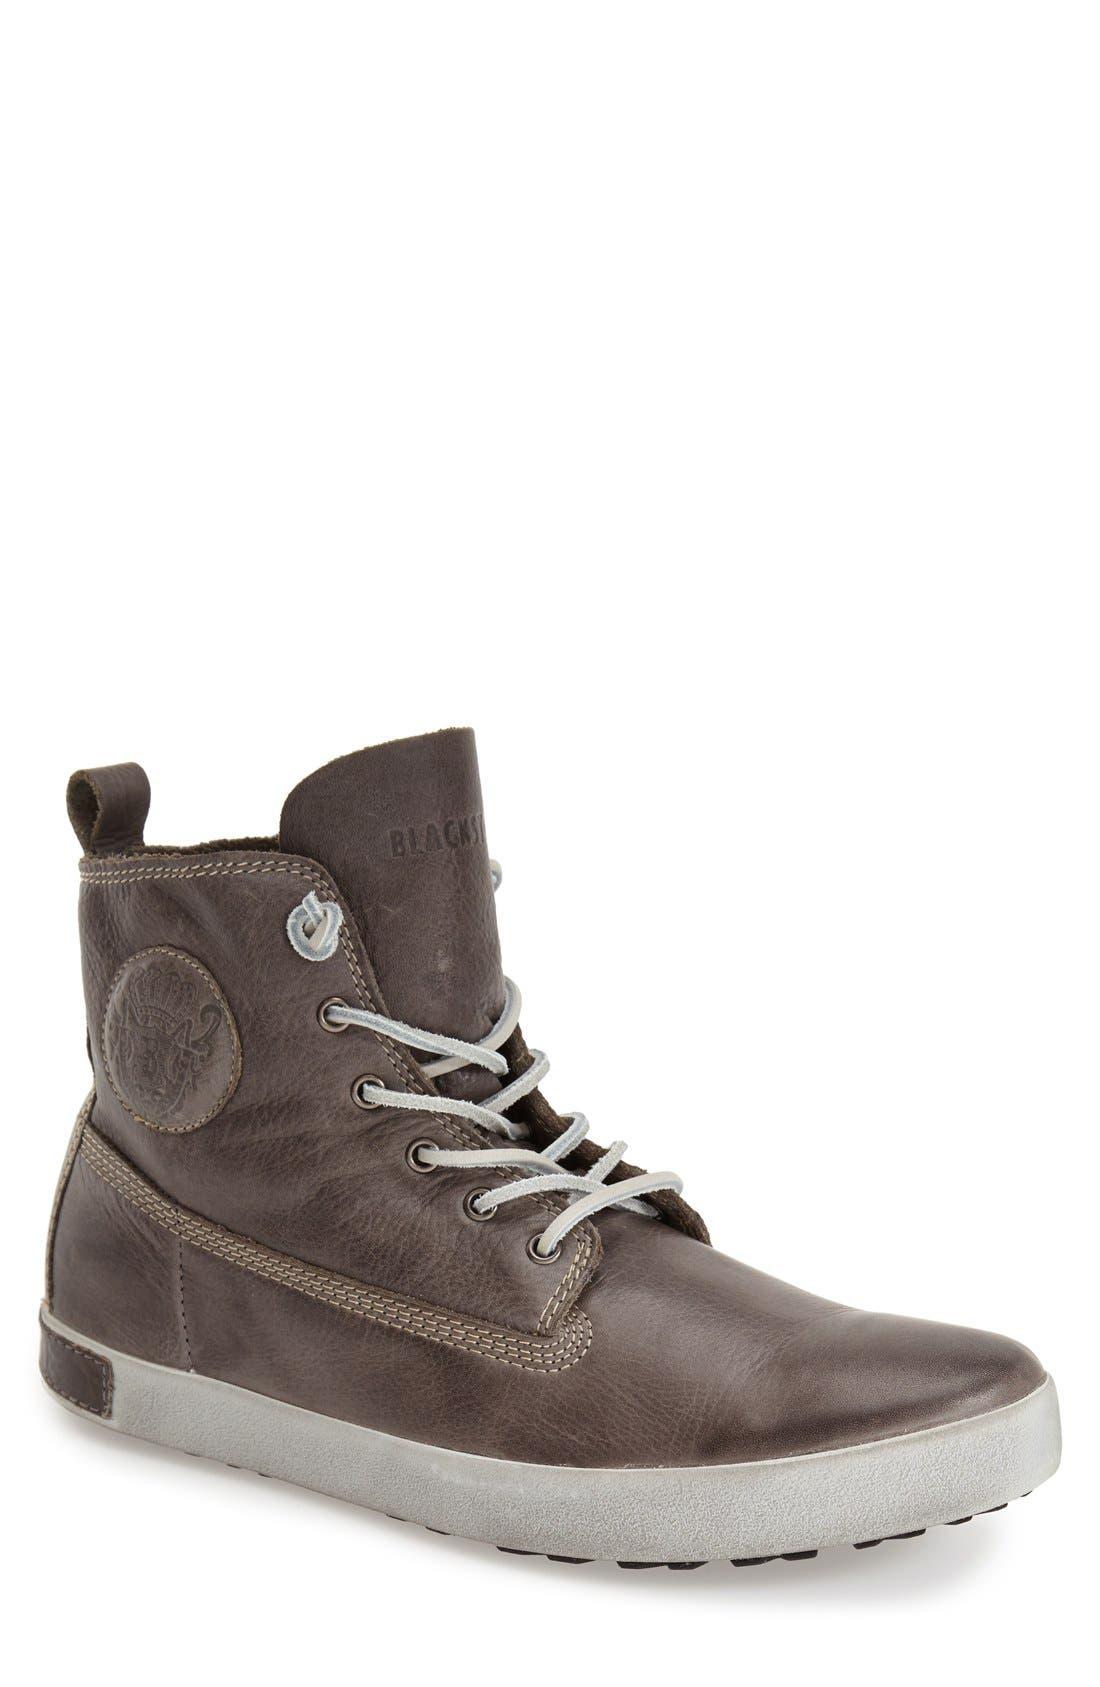 'JM04' Sneaker,                             Main thumbnail 1, color,                             081